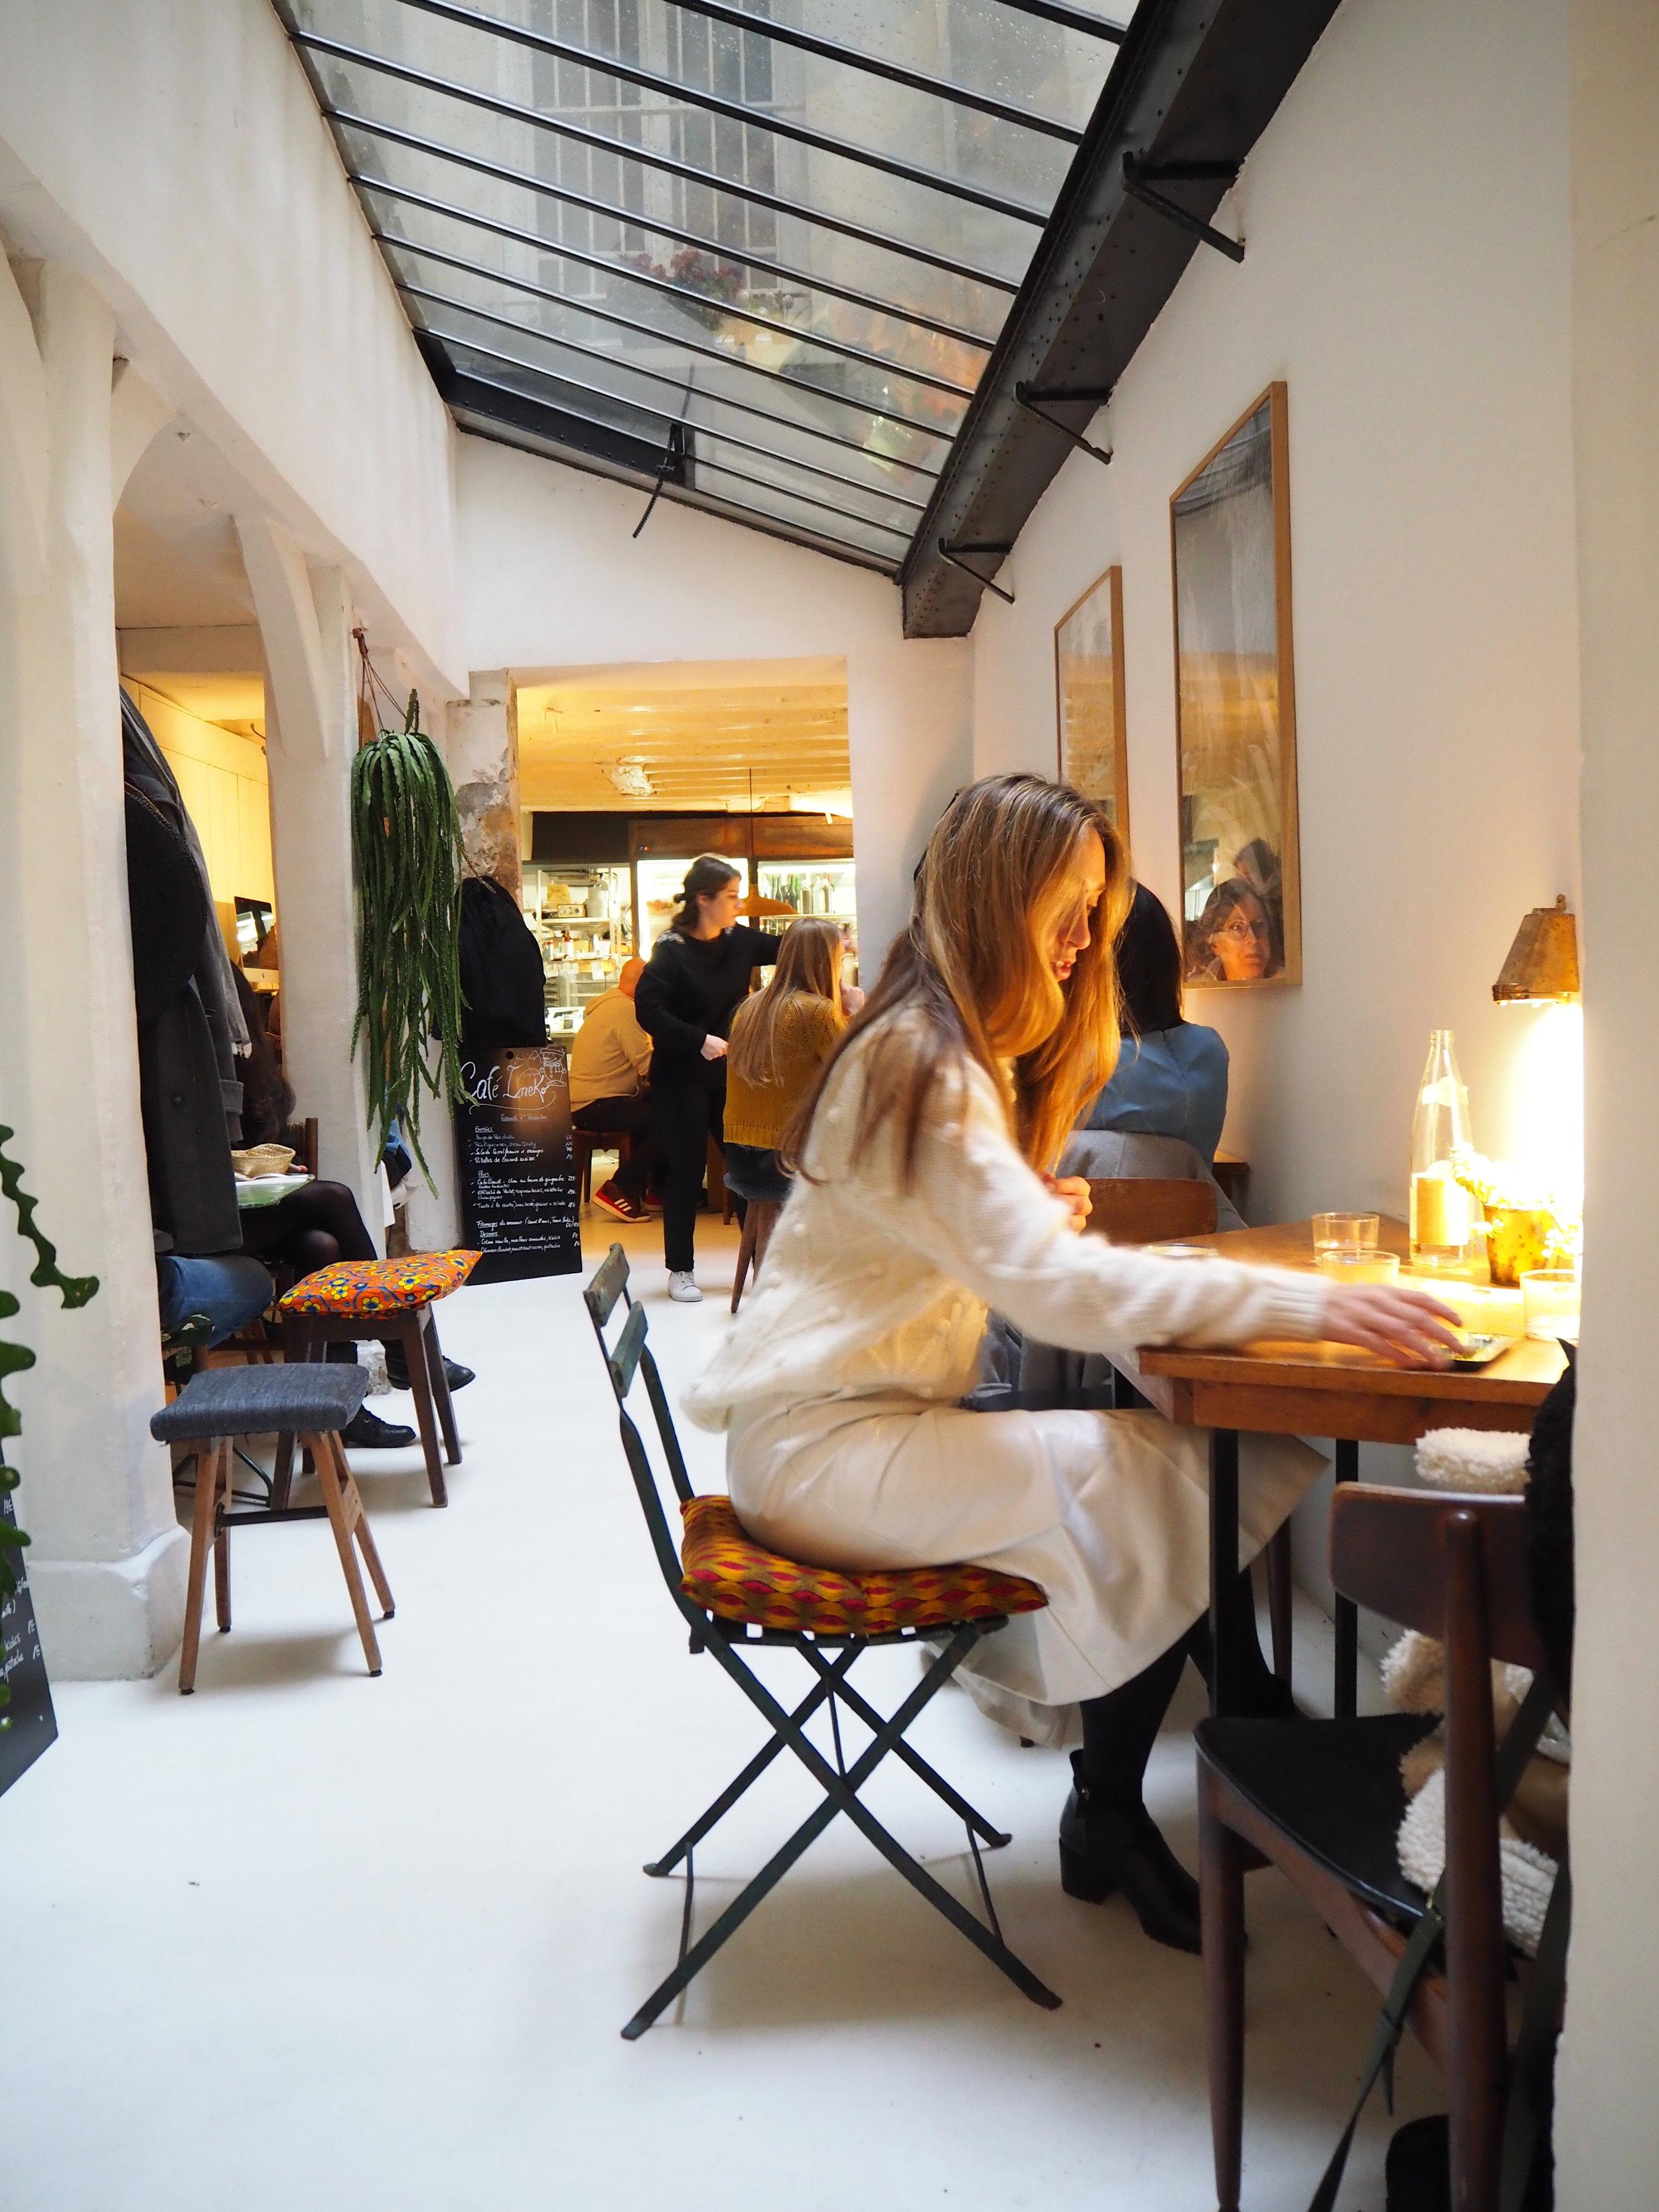 Cafe ineko interiors : potiential header?.JPG